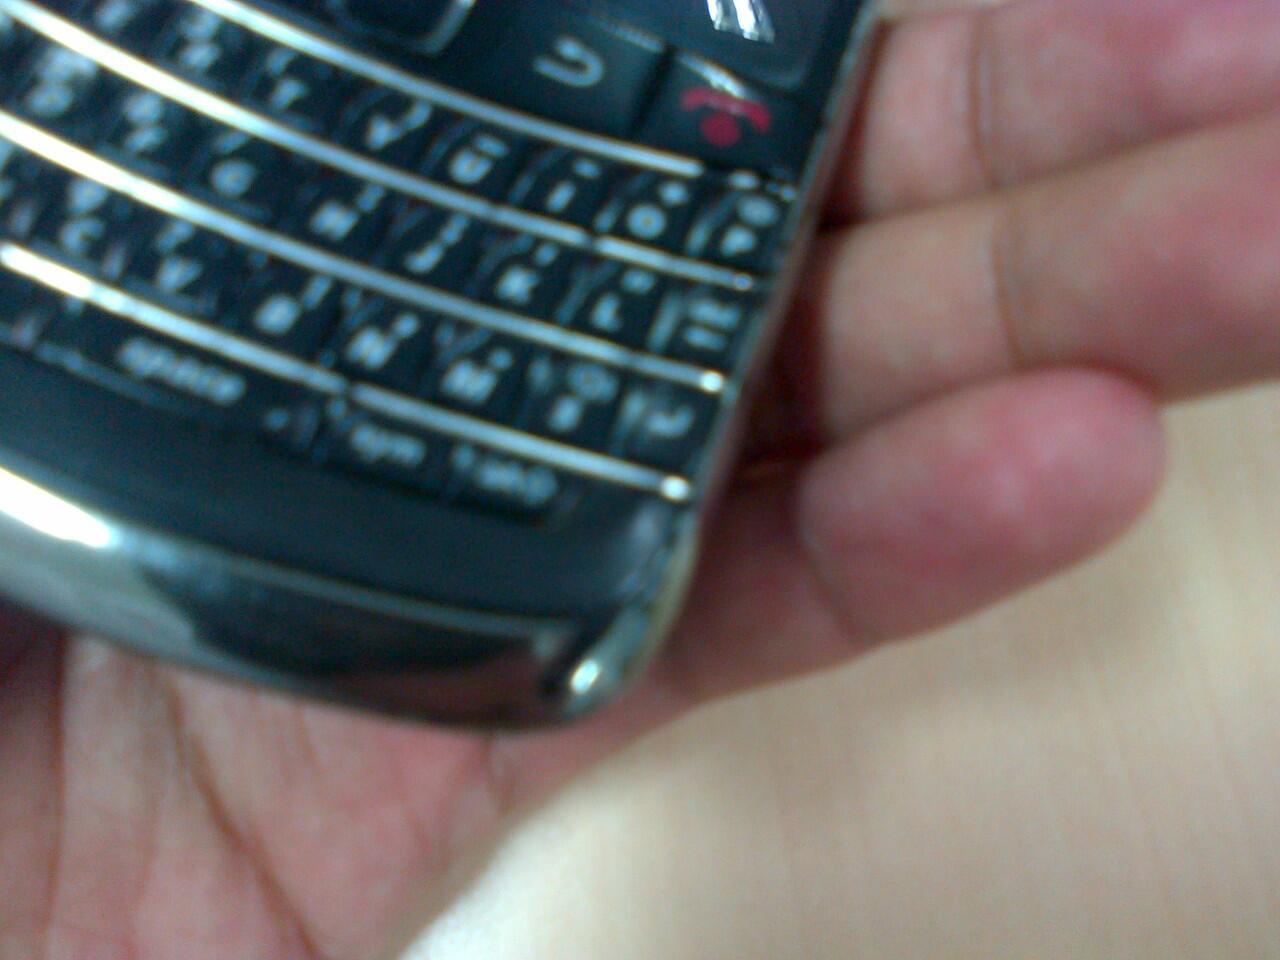 [For Sale] Blackberry / BB Onyx 1 / 9700 Batangan Condition !!!